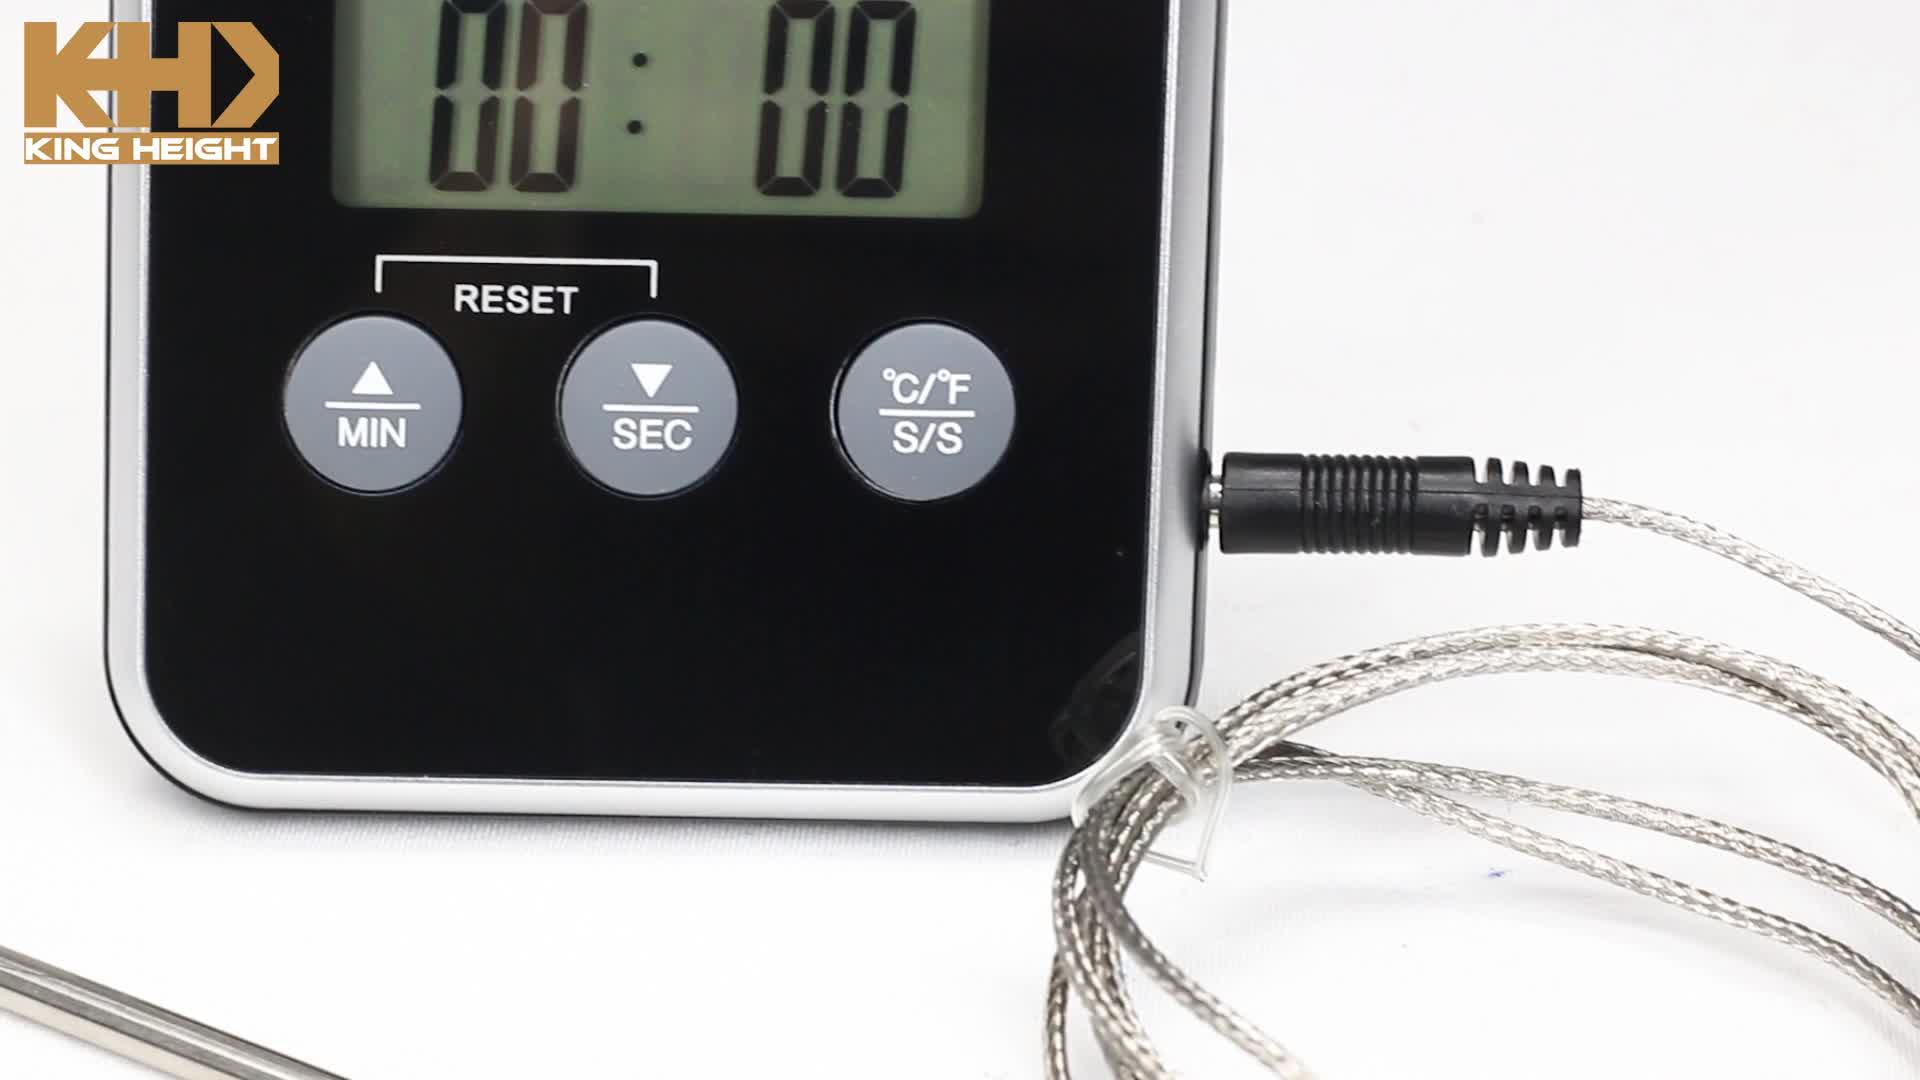 KH-TH057 Hot Mini Water Olie Voedsel Instant Lezen Probe BBQ Koken Keuken Digitale Vlees Thermometer